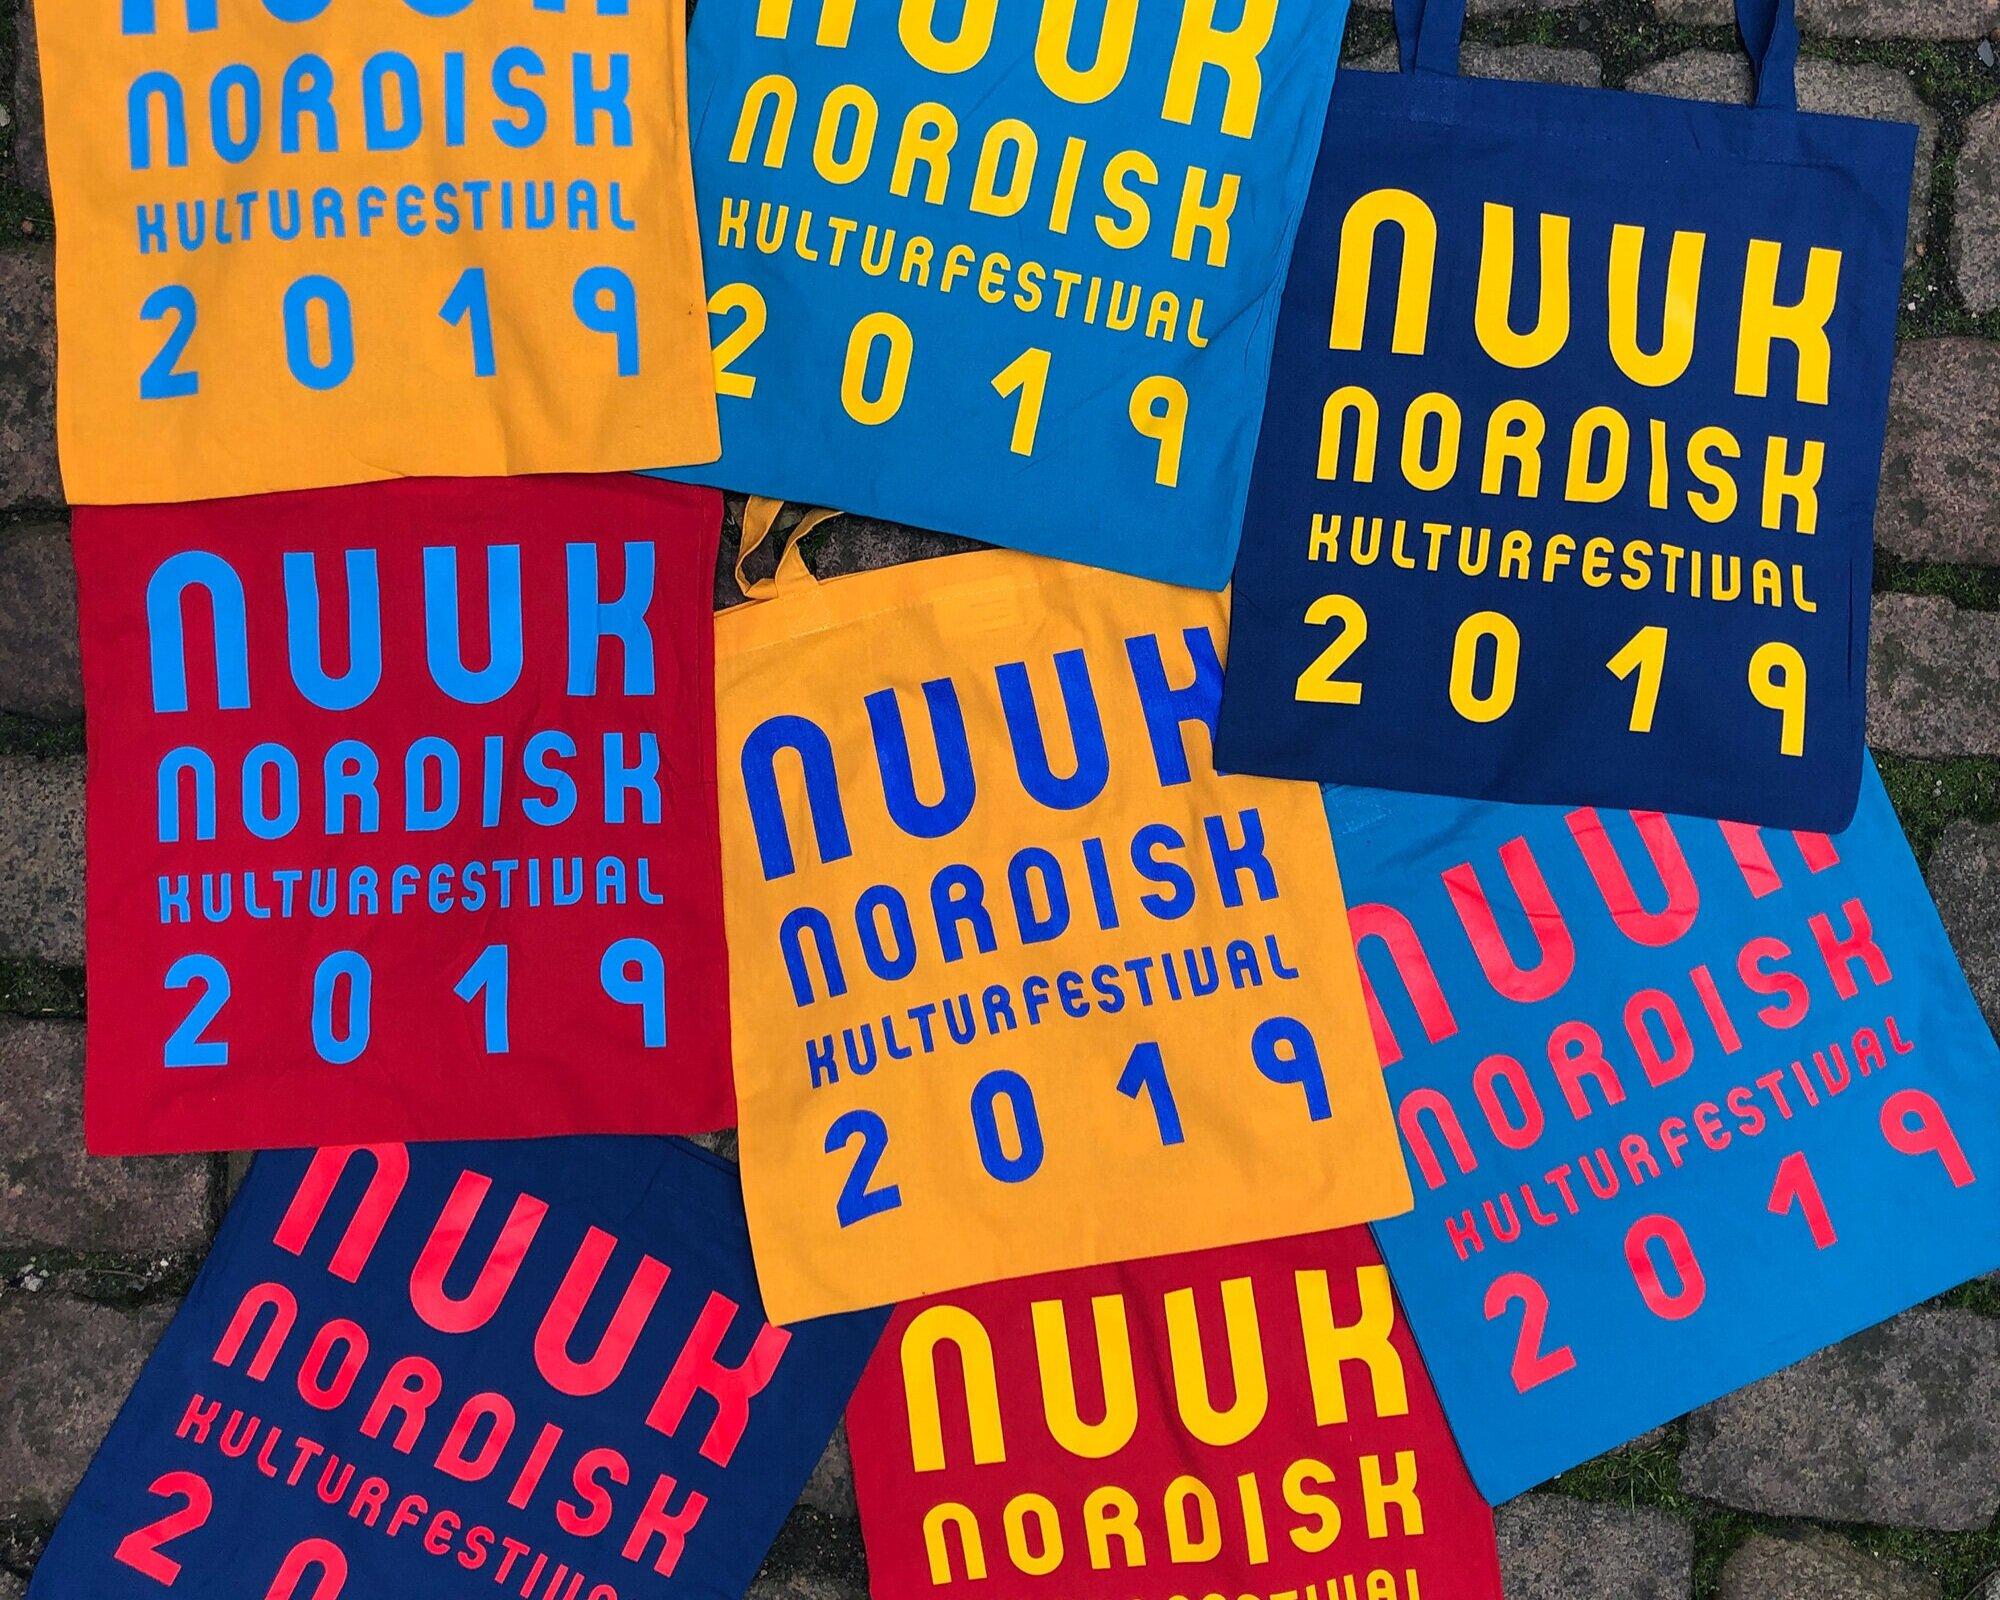 Nuuk+Nordisk+Kulturfestival%2C+muleposer.+Foto+-+Nuuk+Nordisk+Kulturfestival.jpg